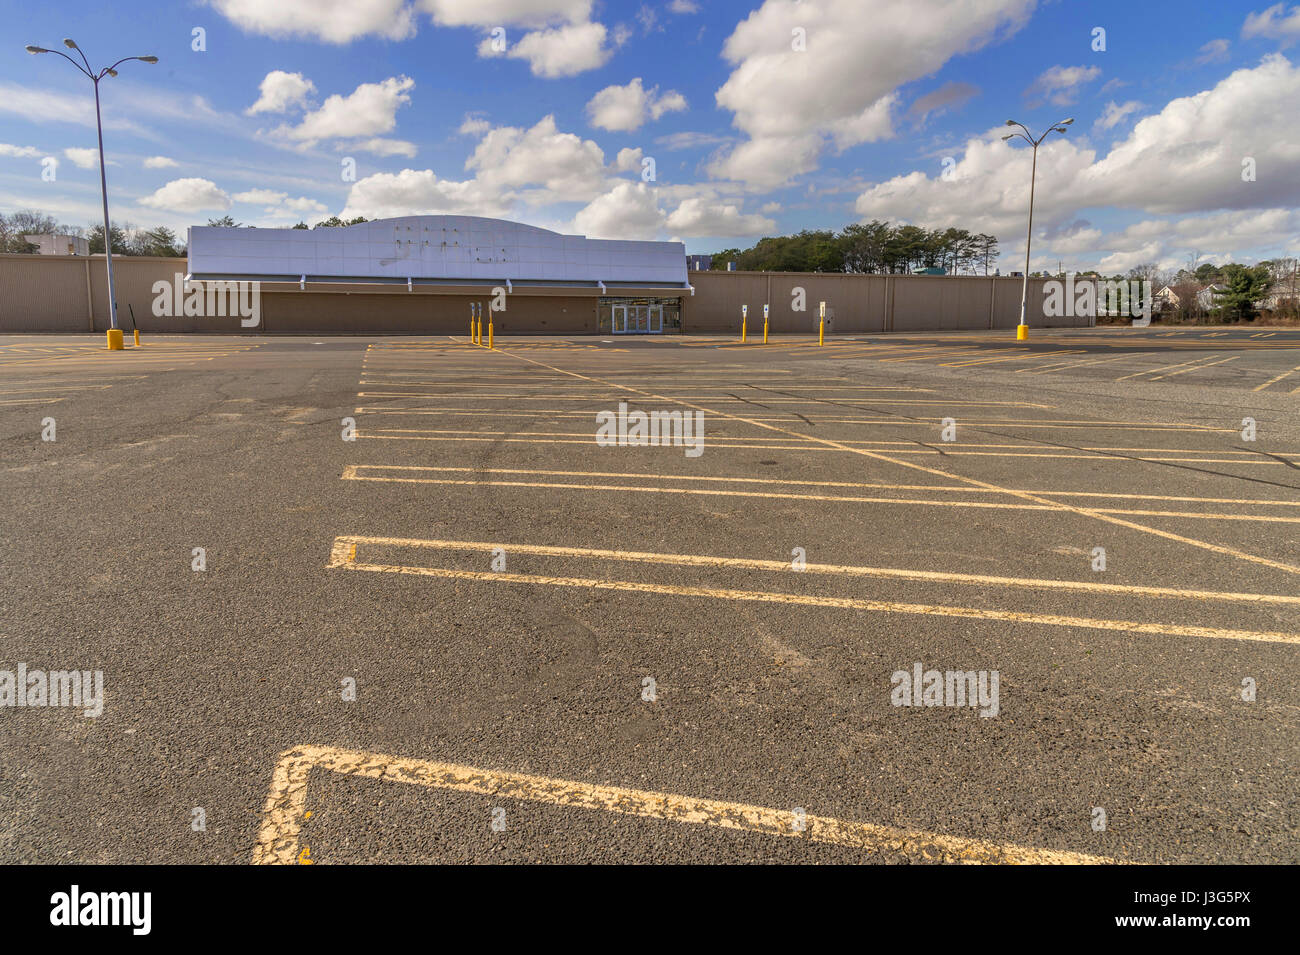 Closed Retail Store - Stock Image